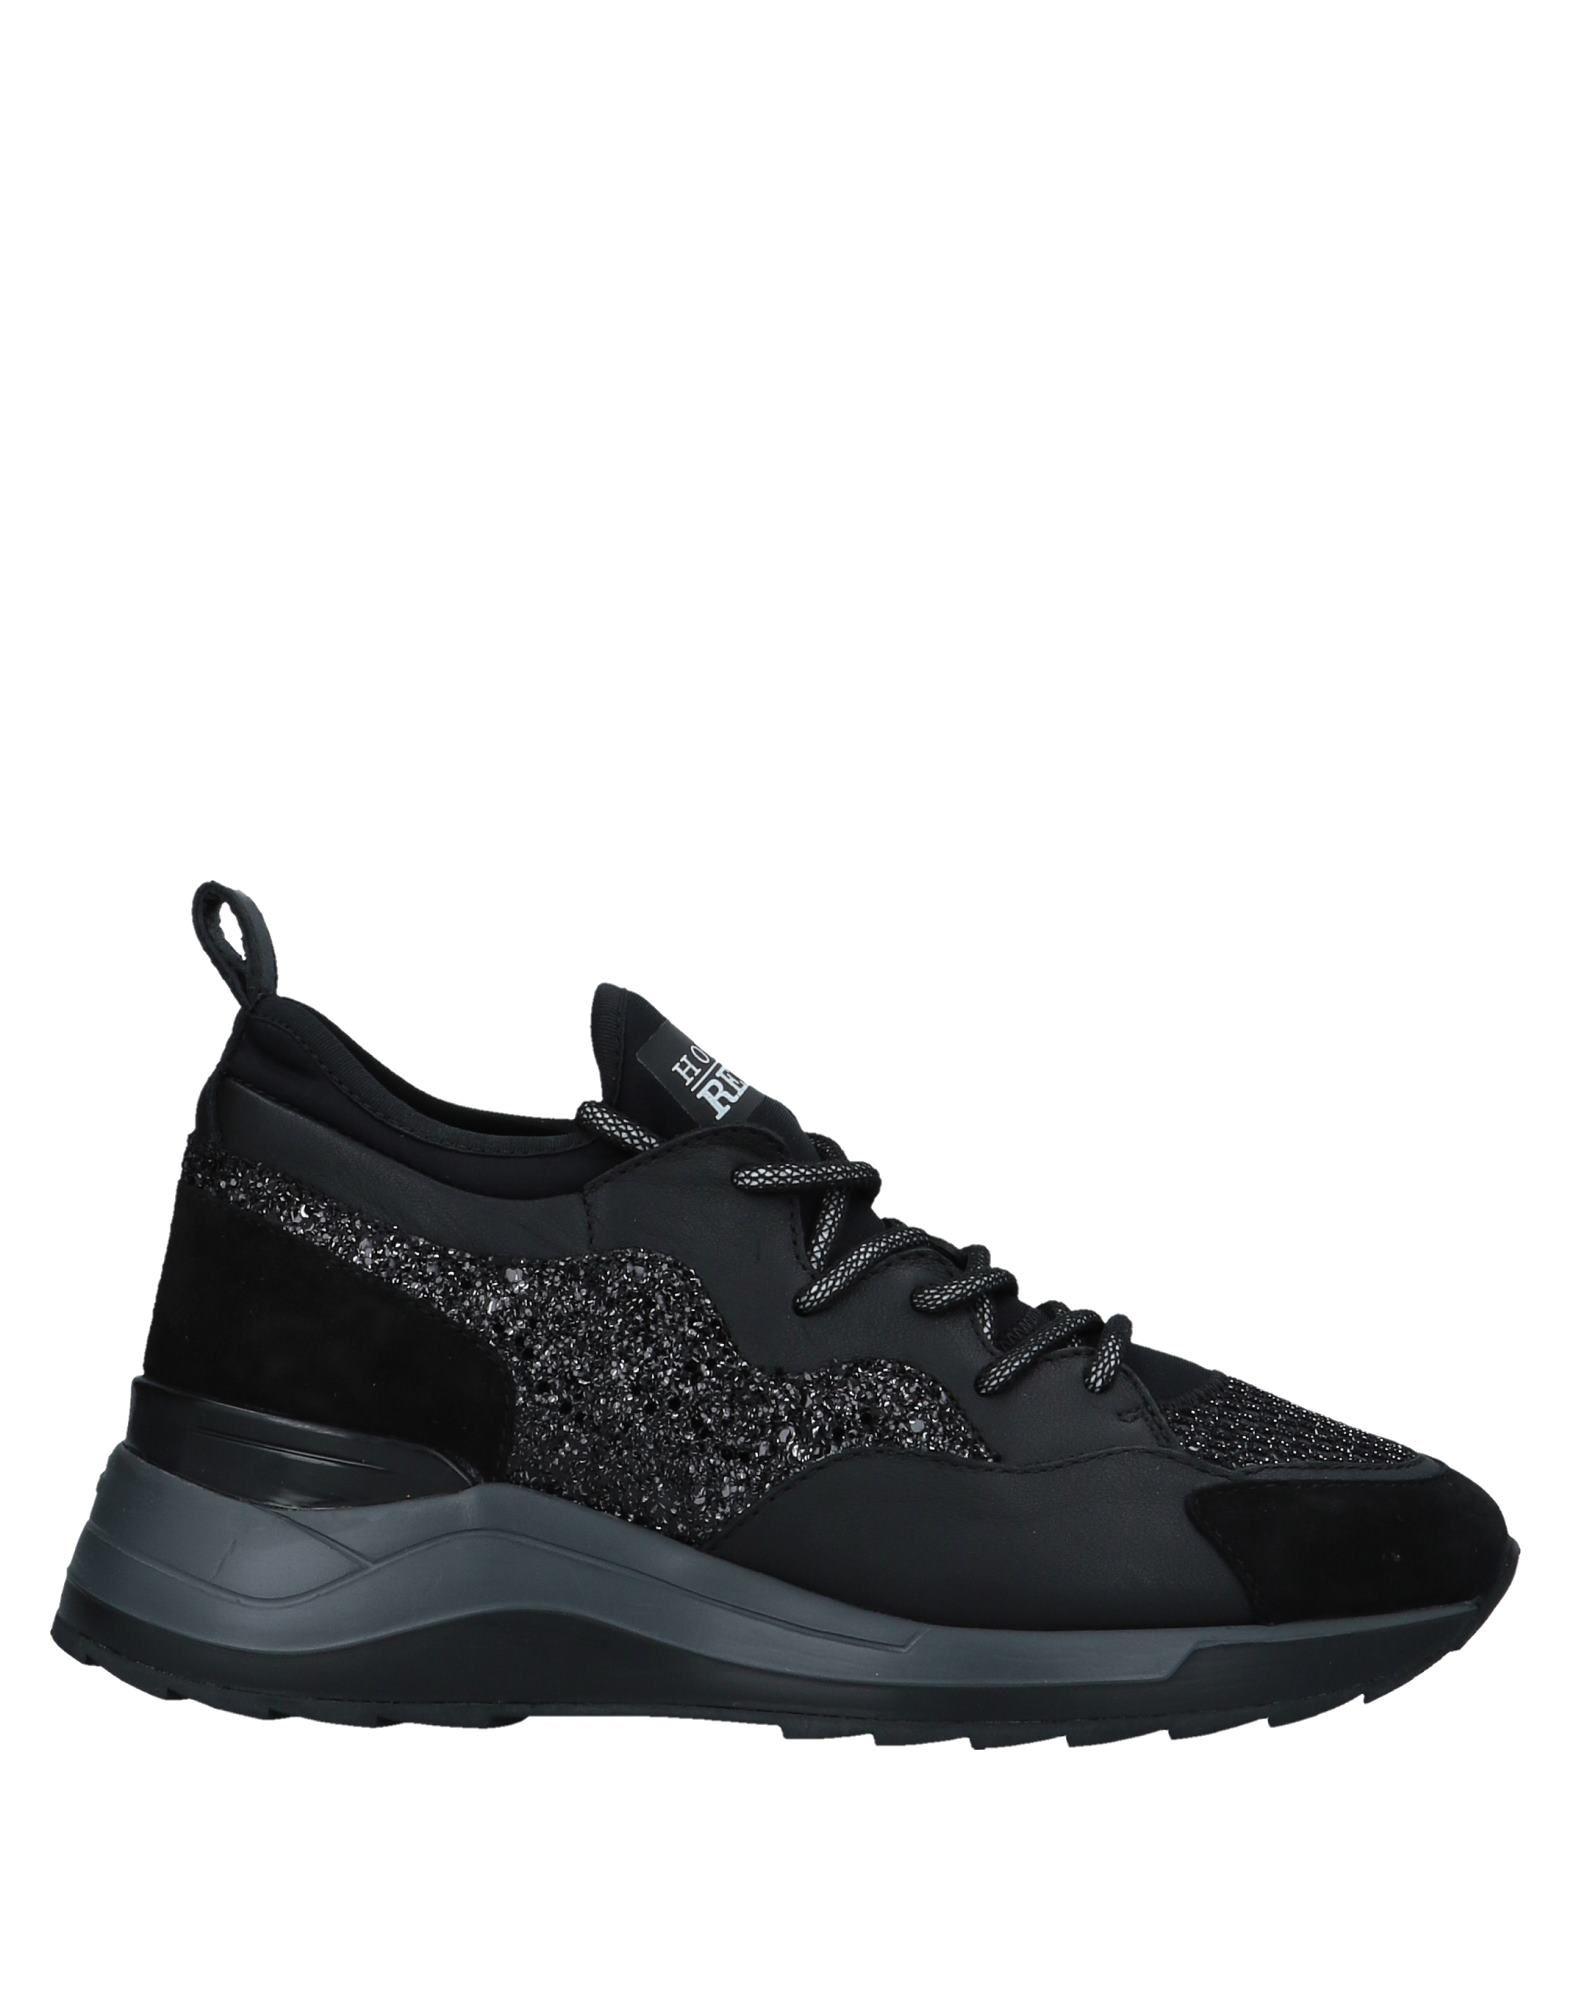 Hogan Rebel Sneakers Damen  11539991IQ Beliebte Schuhe